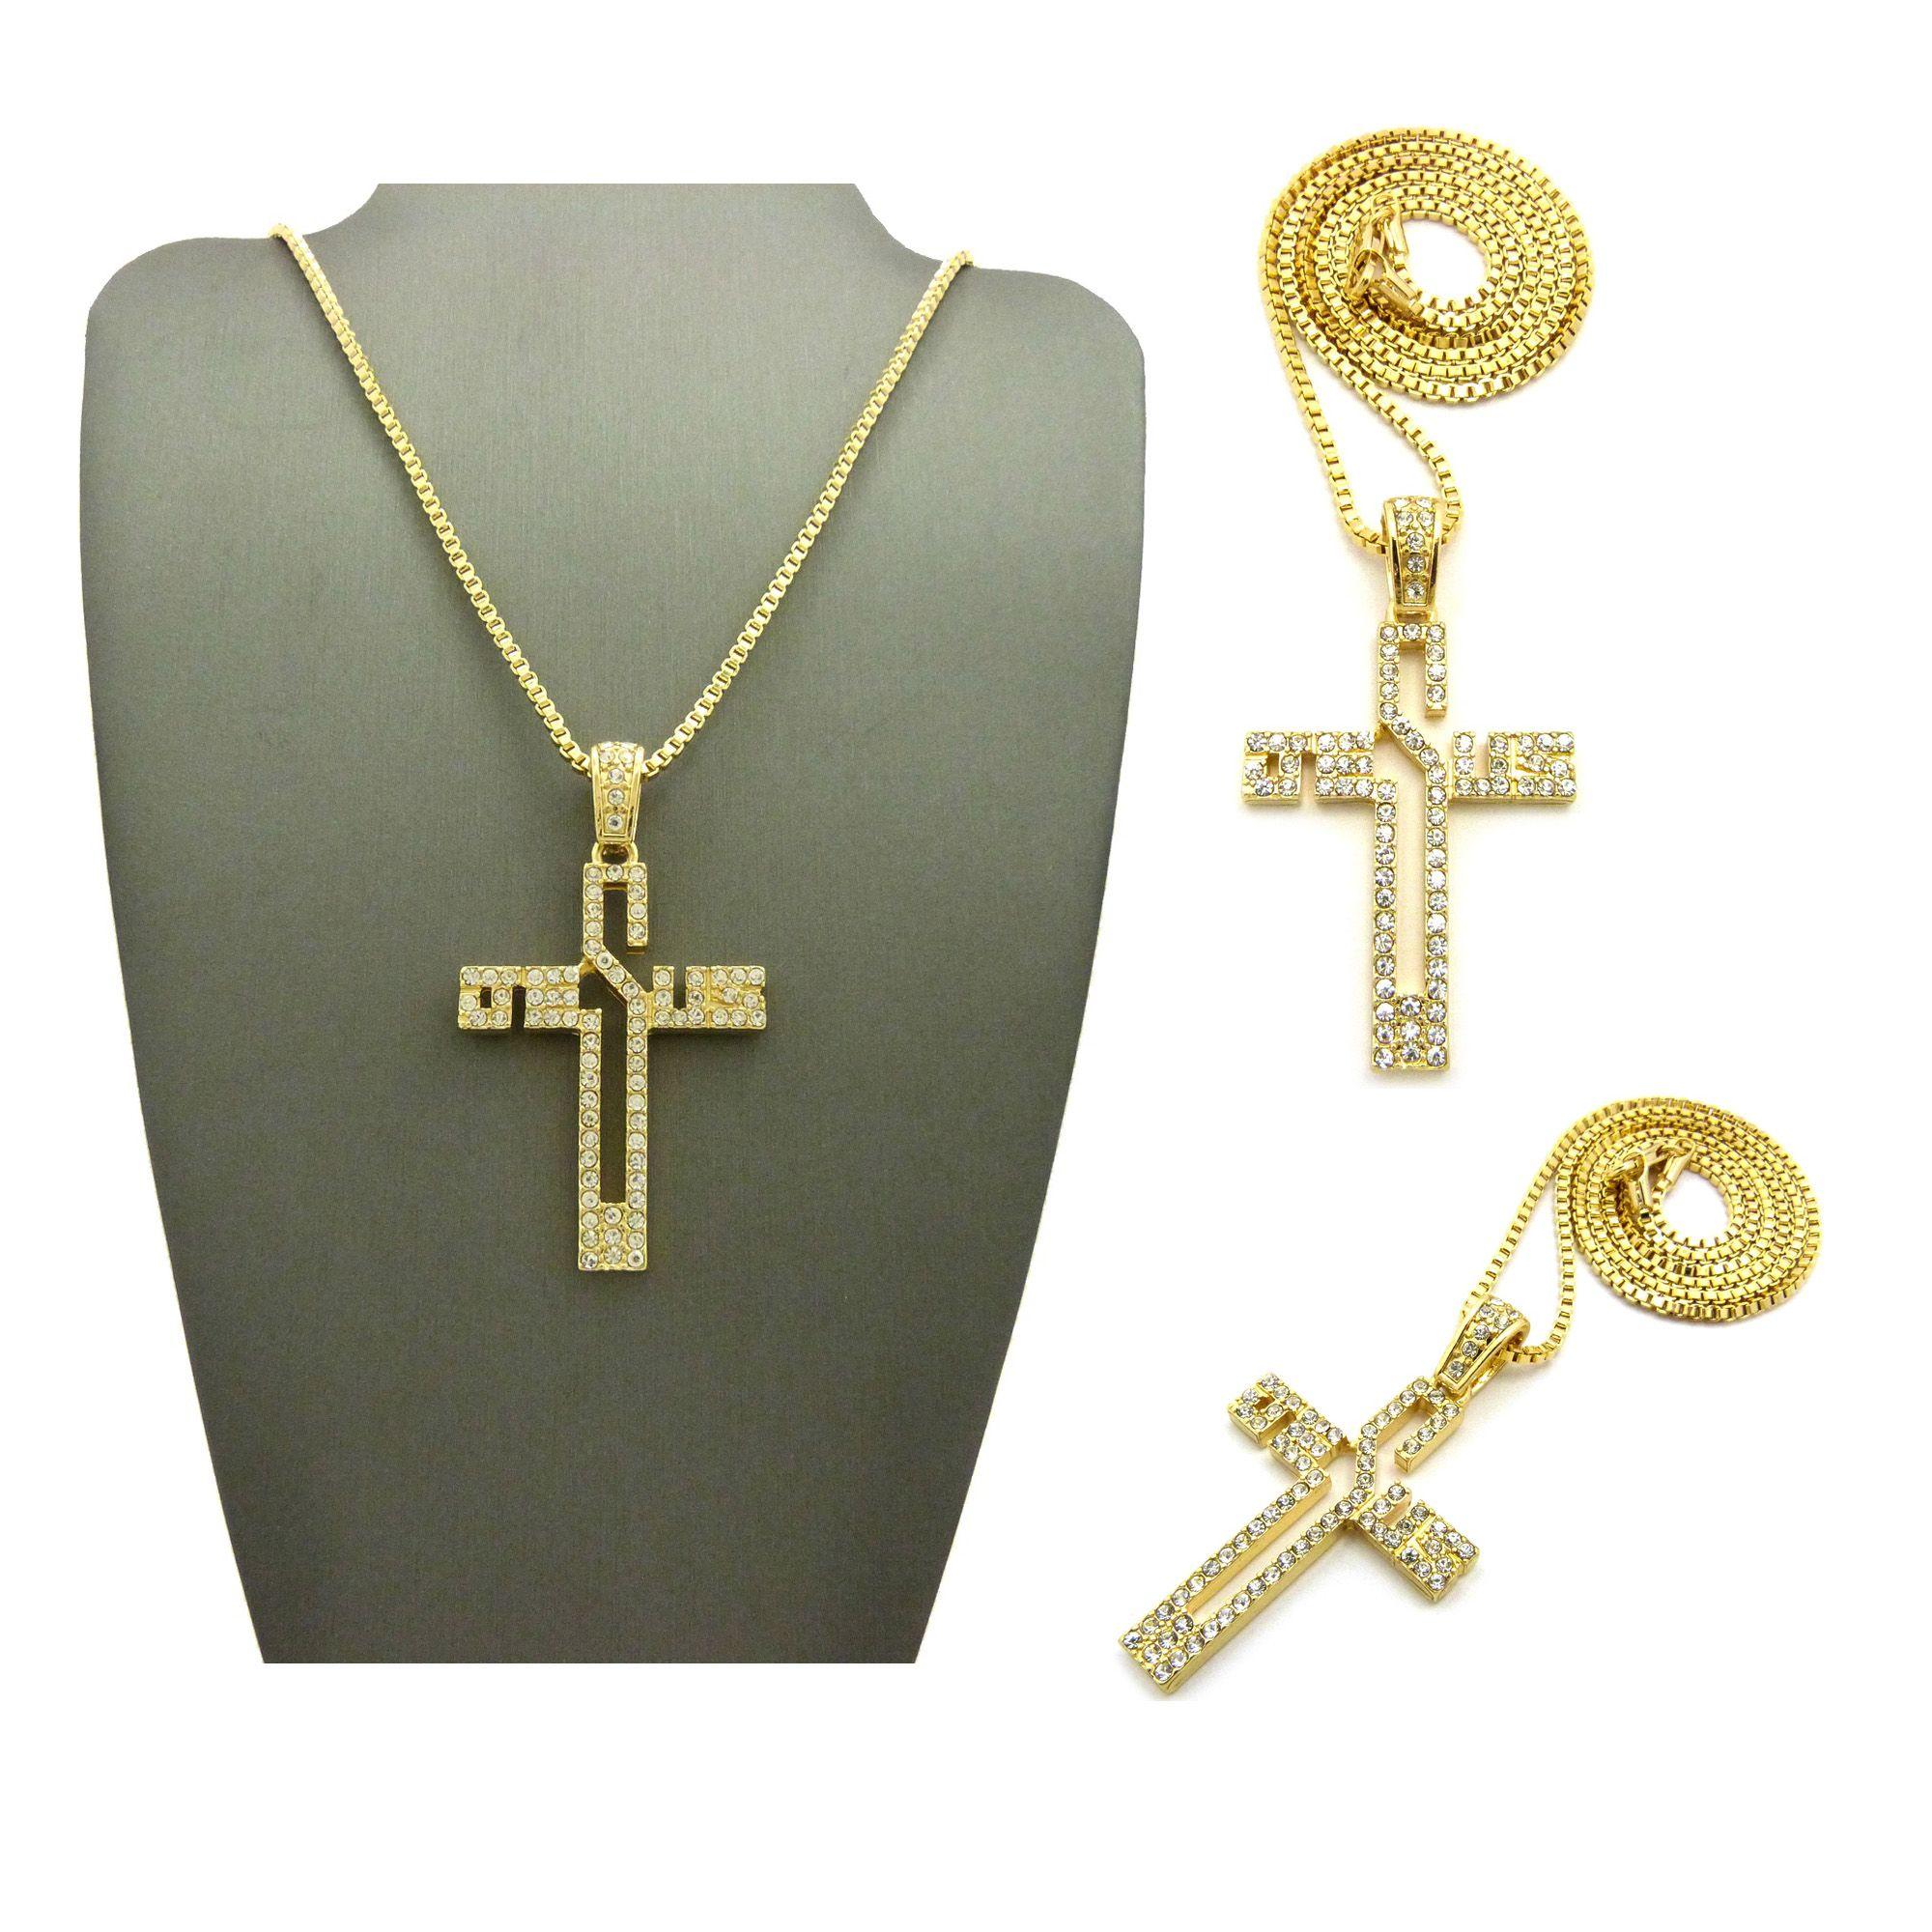 Iced out cross jesus pendant 24 box chain hip hop necklace xqp73bxg aloadofball Images